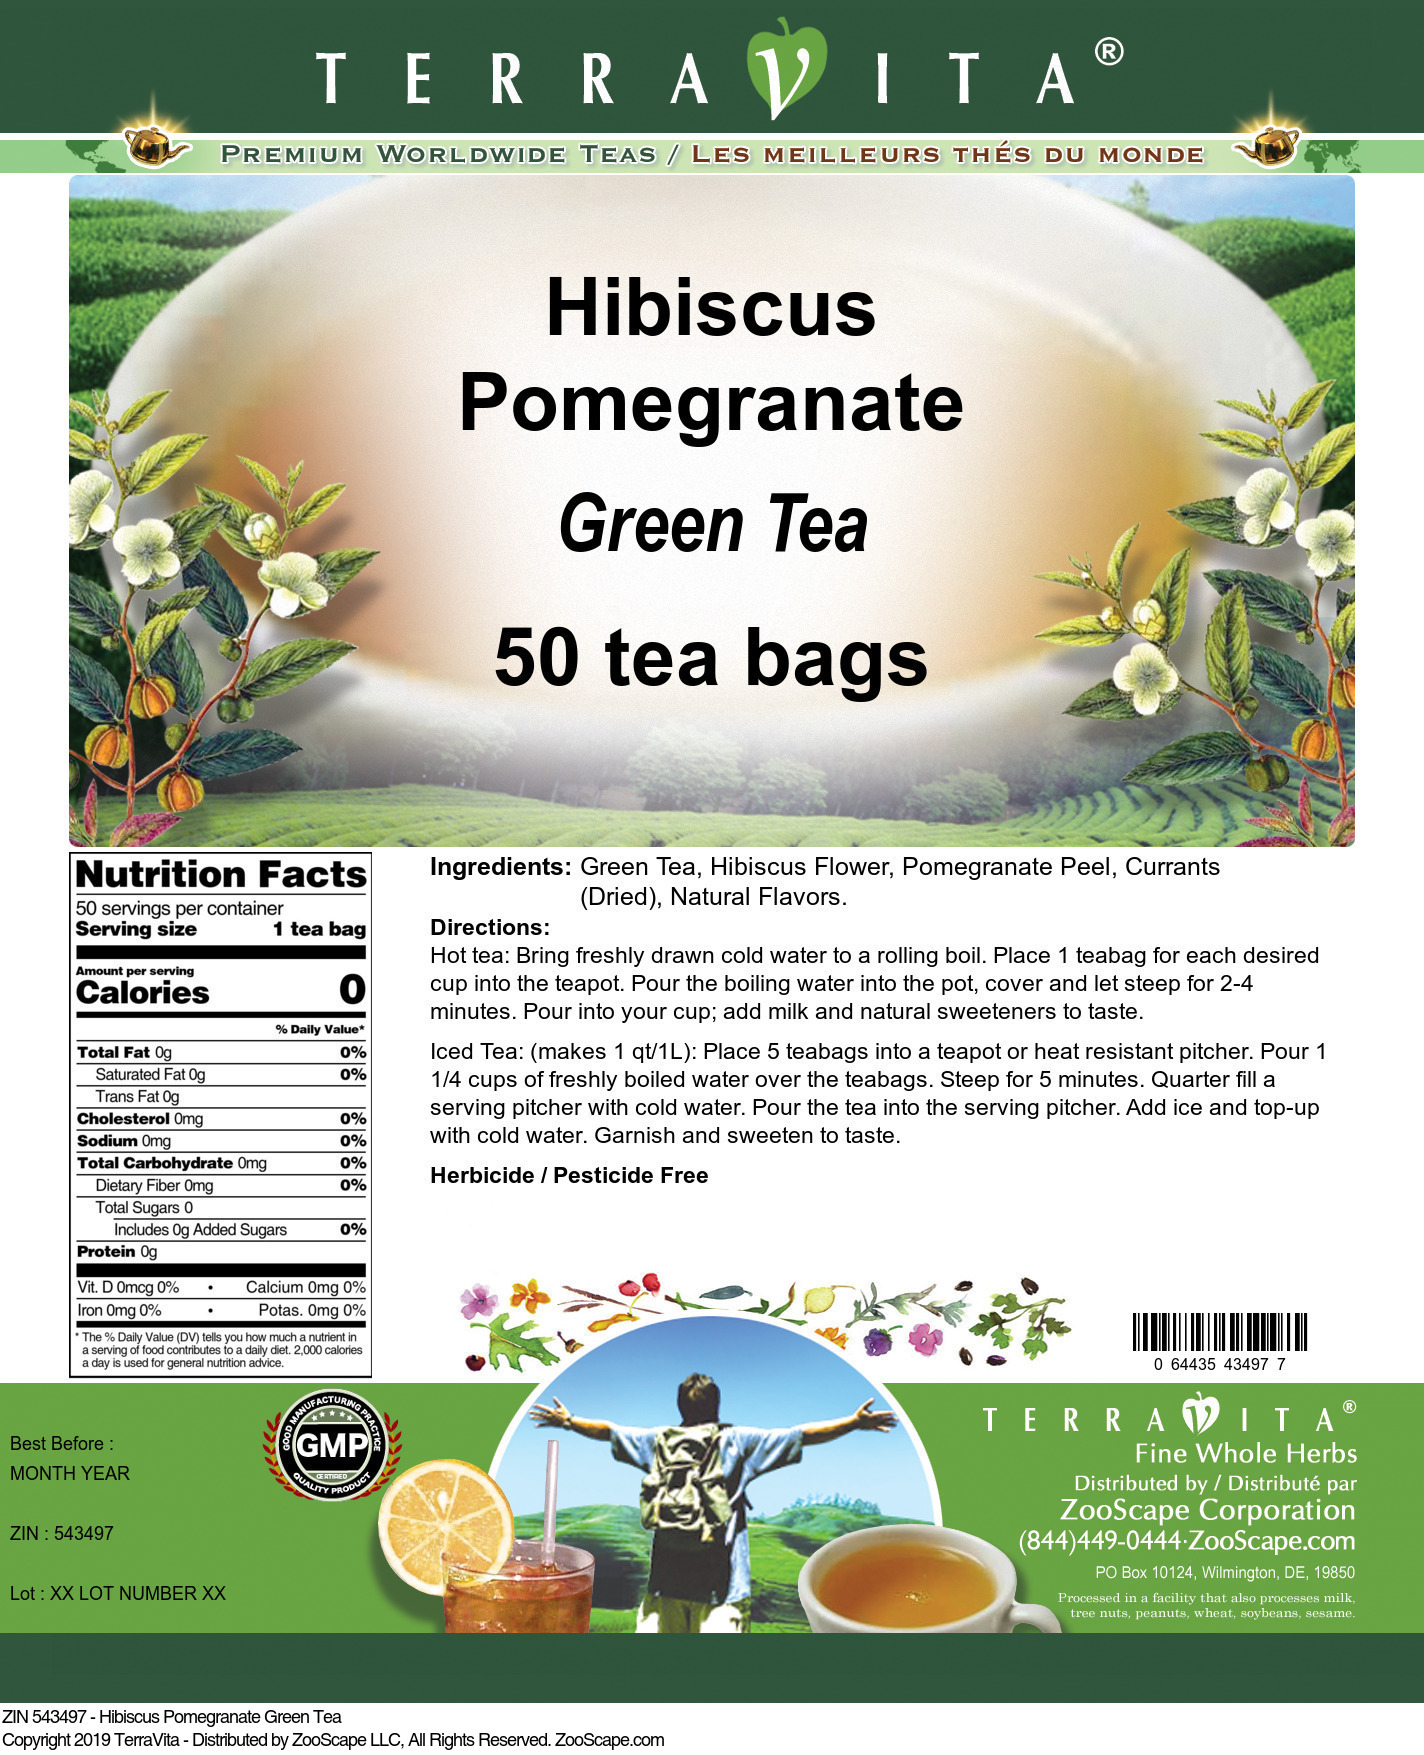 Hibiscus Pomegranate Green Tea